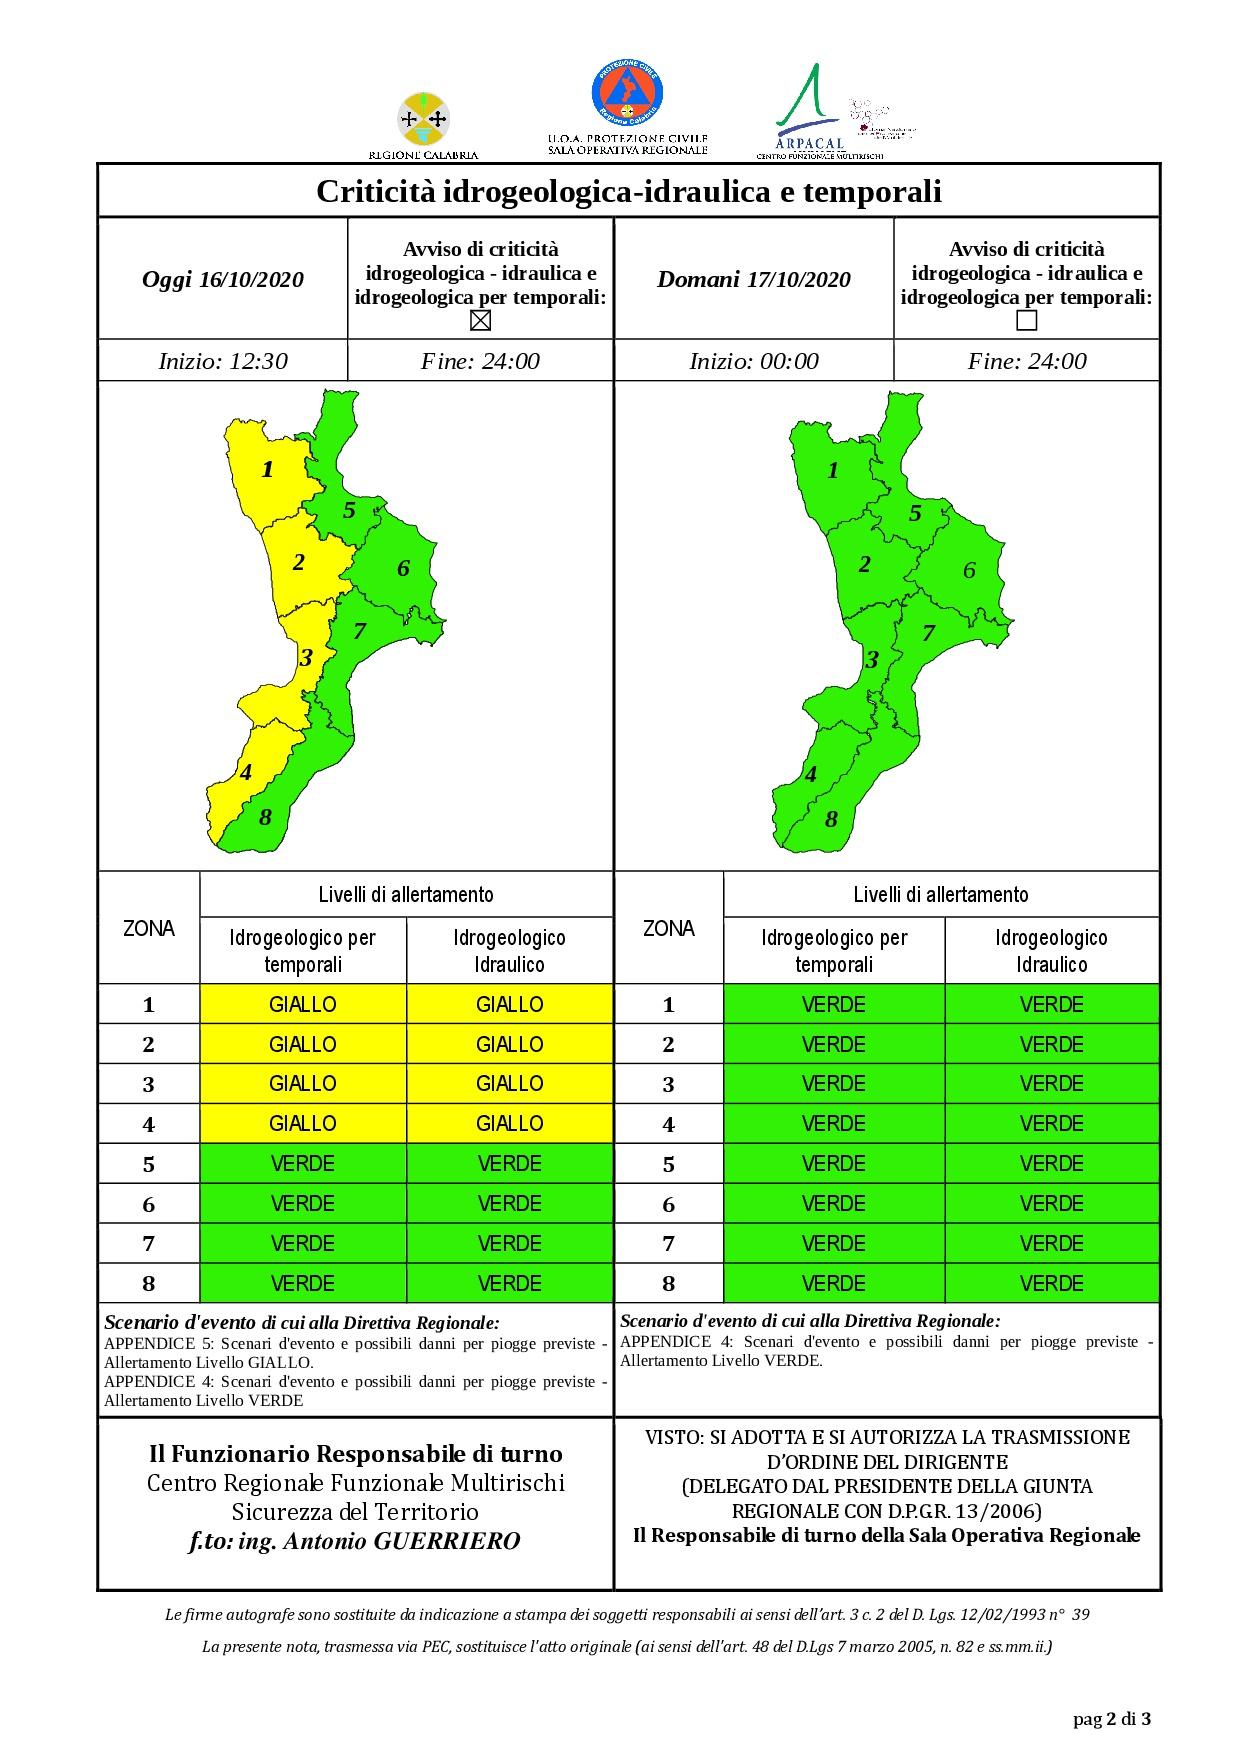 Criticità idrogeologica-idraulica e temporali in Calabria 16-10-2020